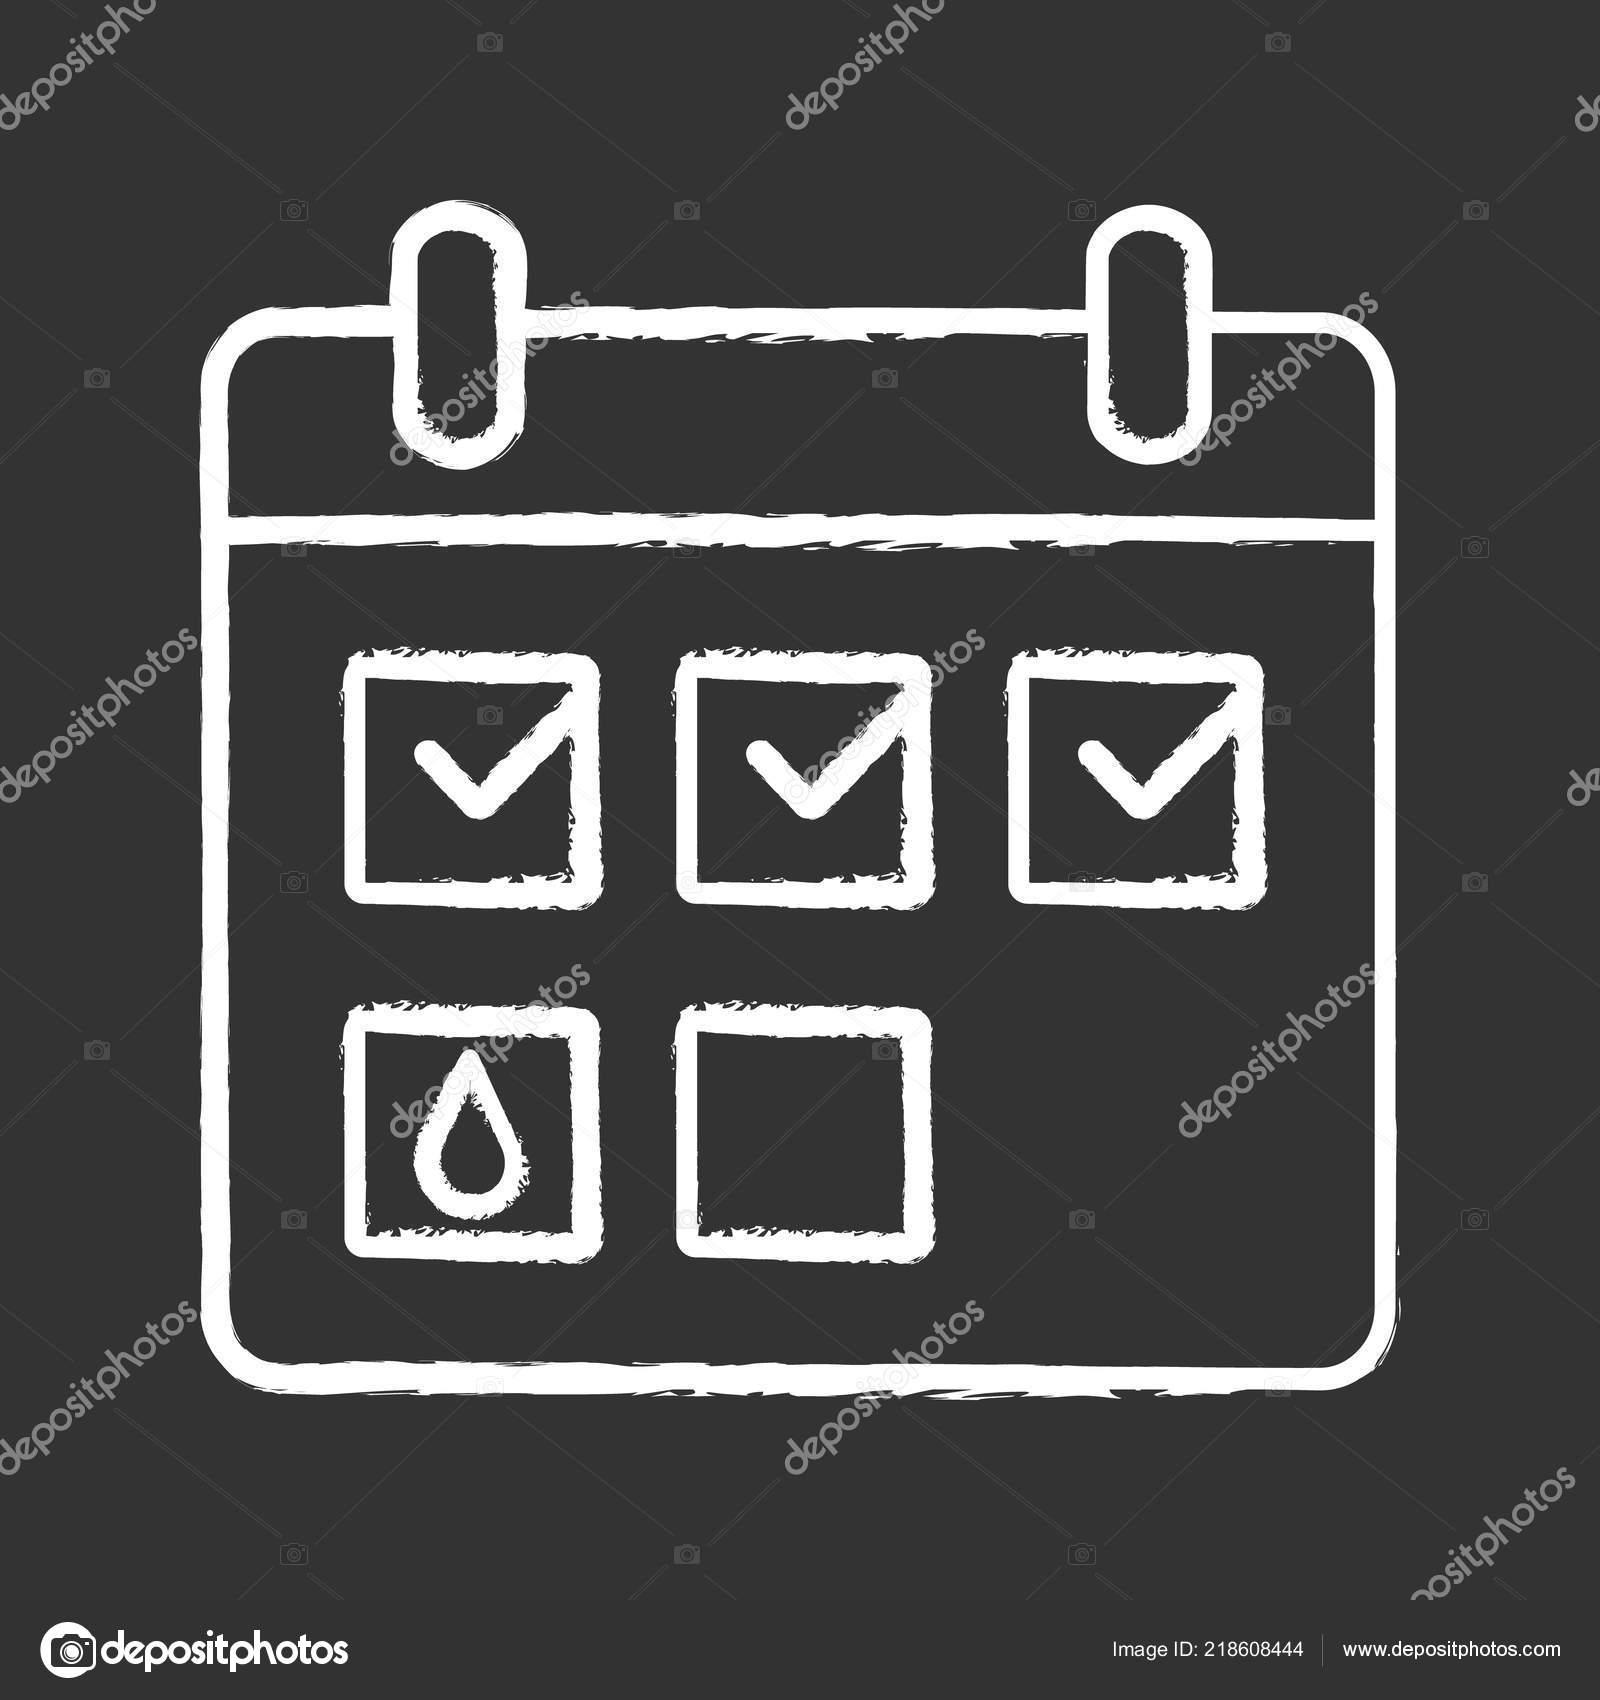 menstrual calendar and ovulation calculator